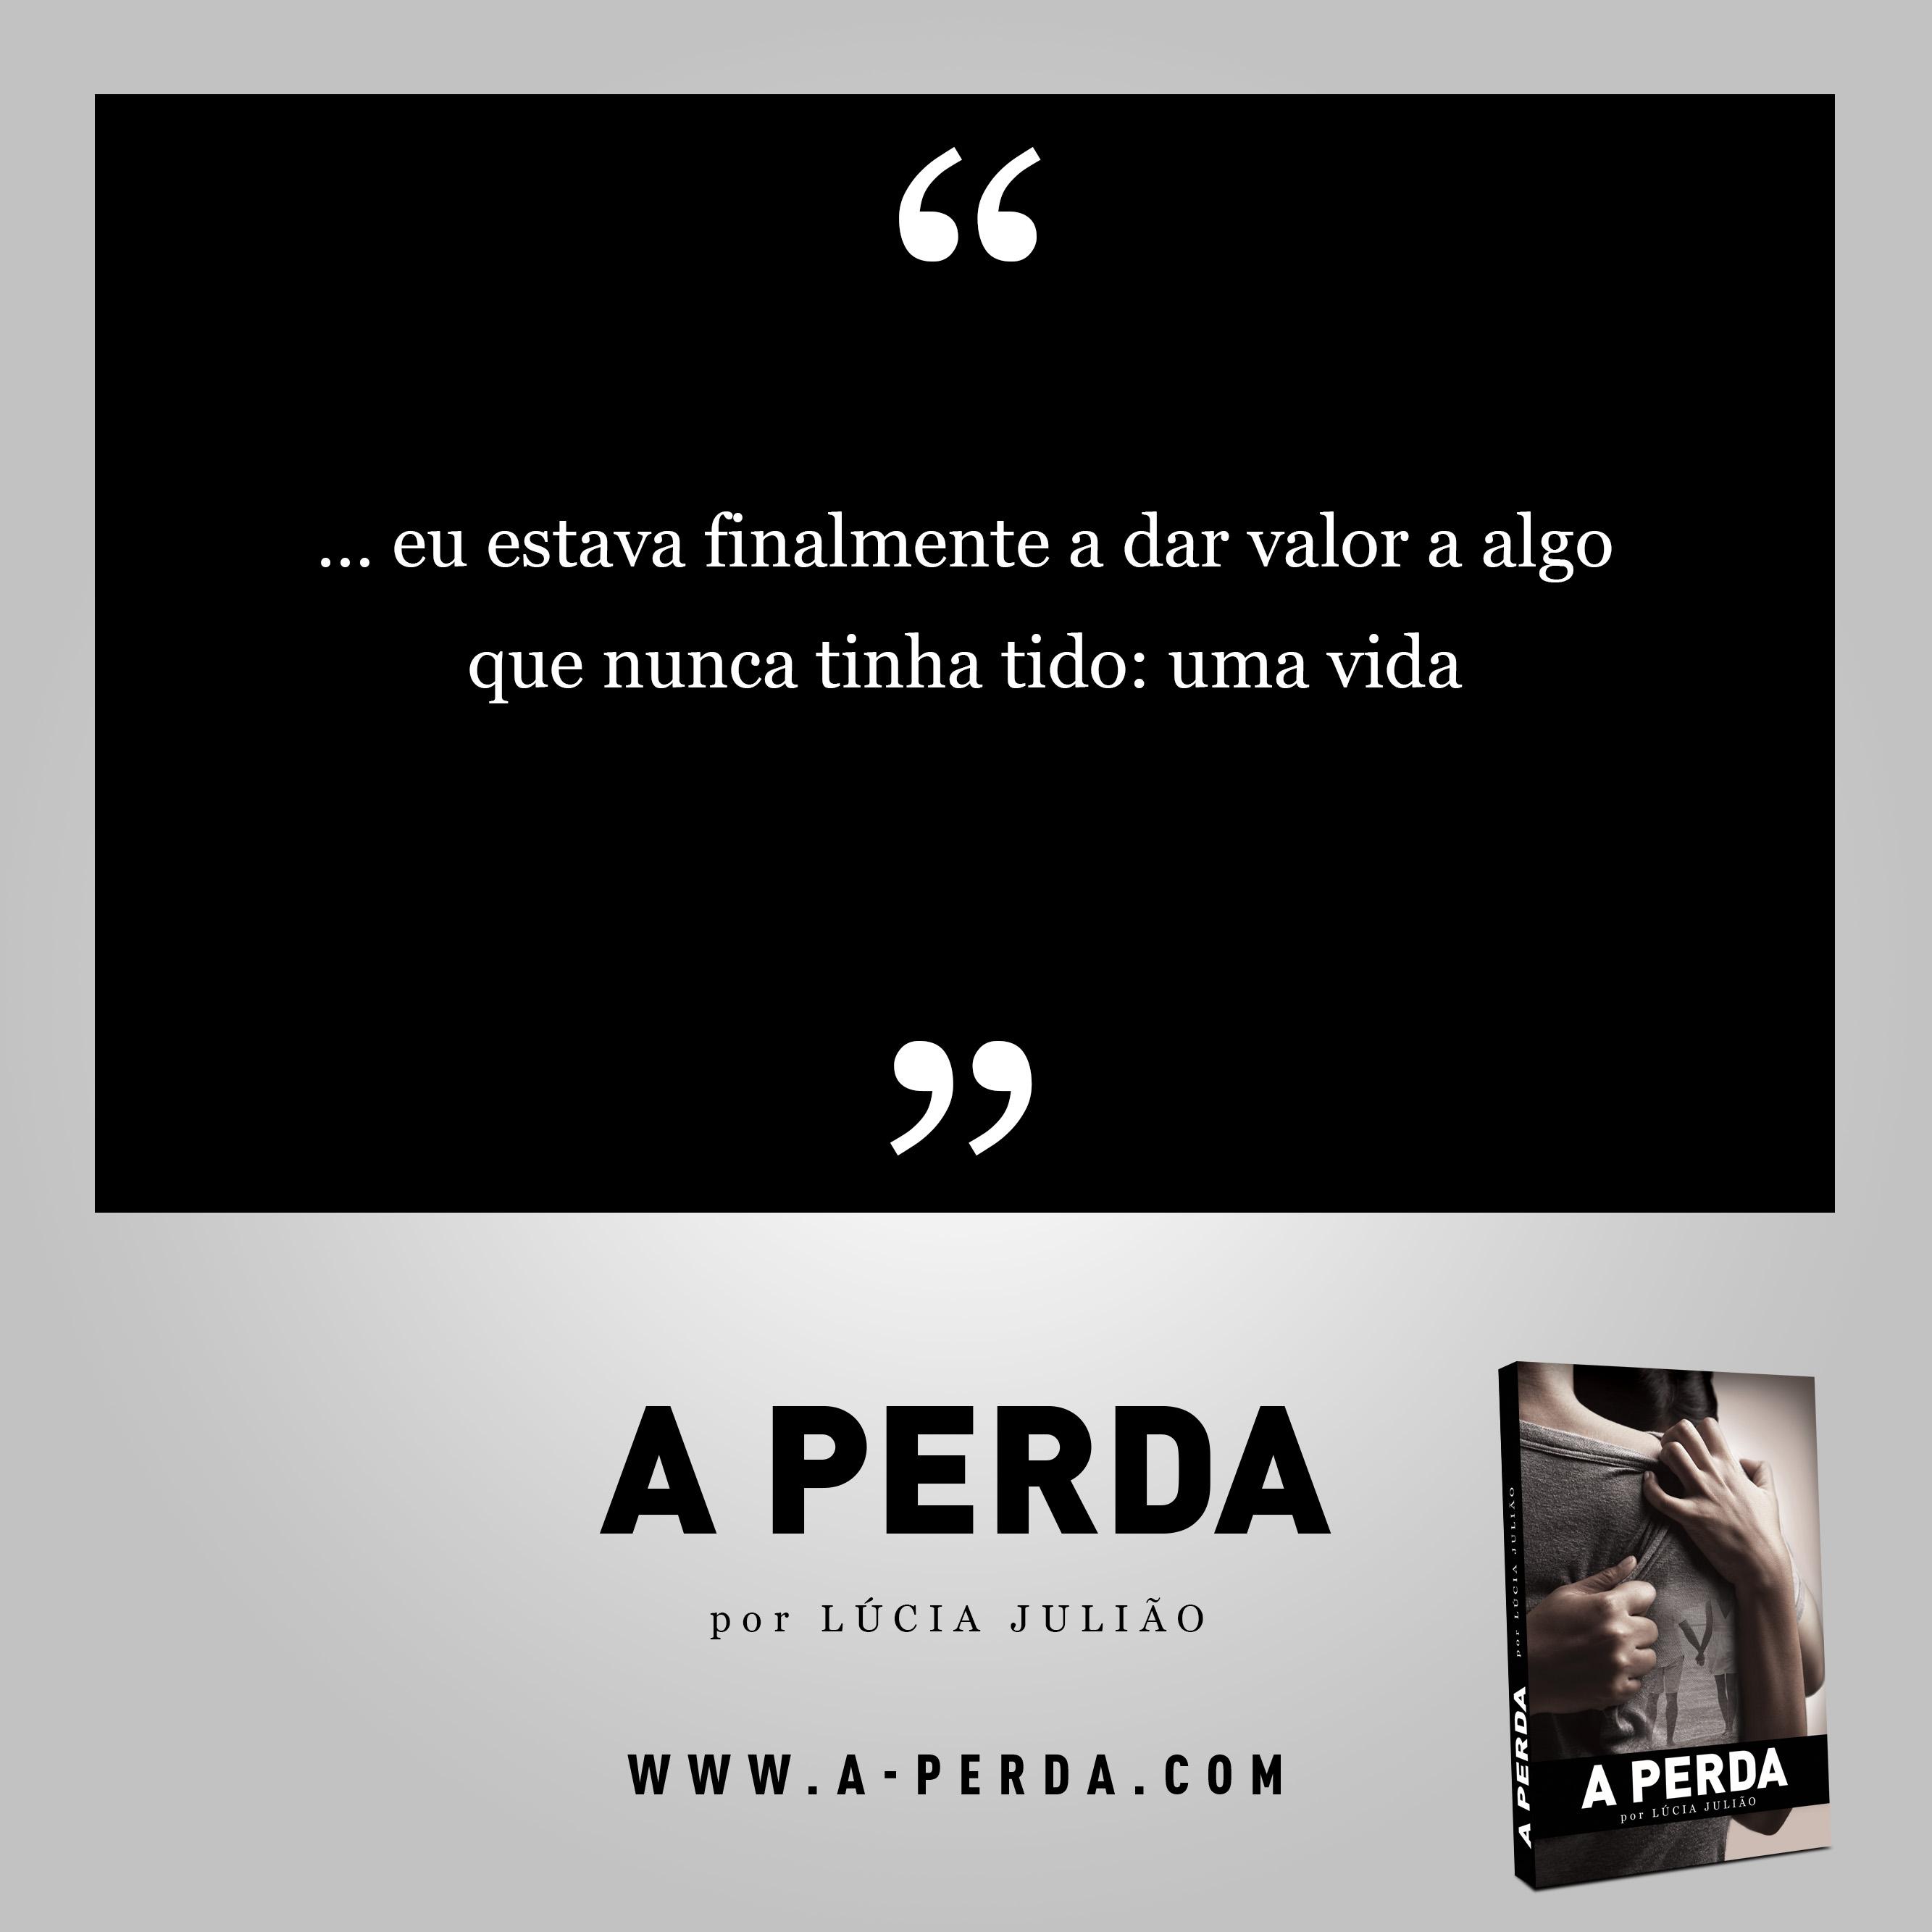 005-capitulo-2-livro-a-Perda-de-Lucia-Juliao-instagram